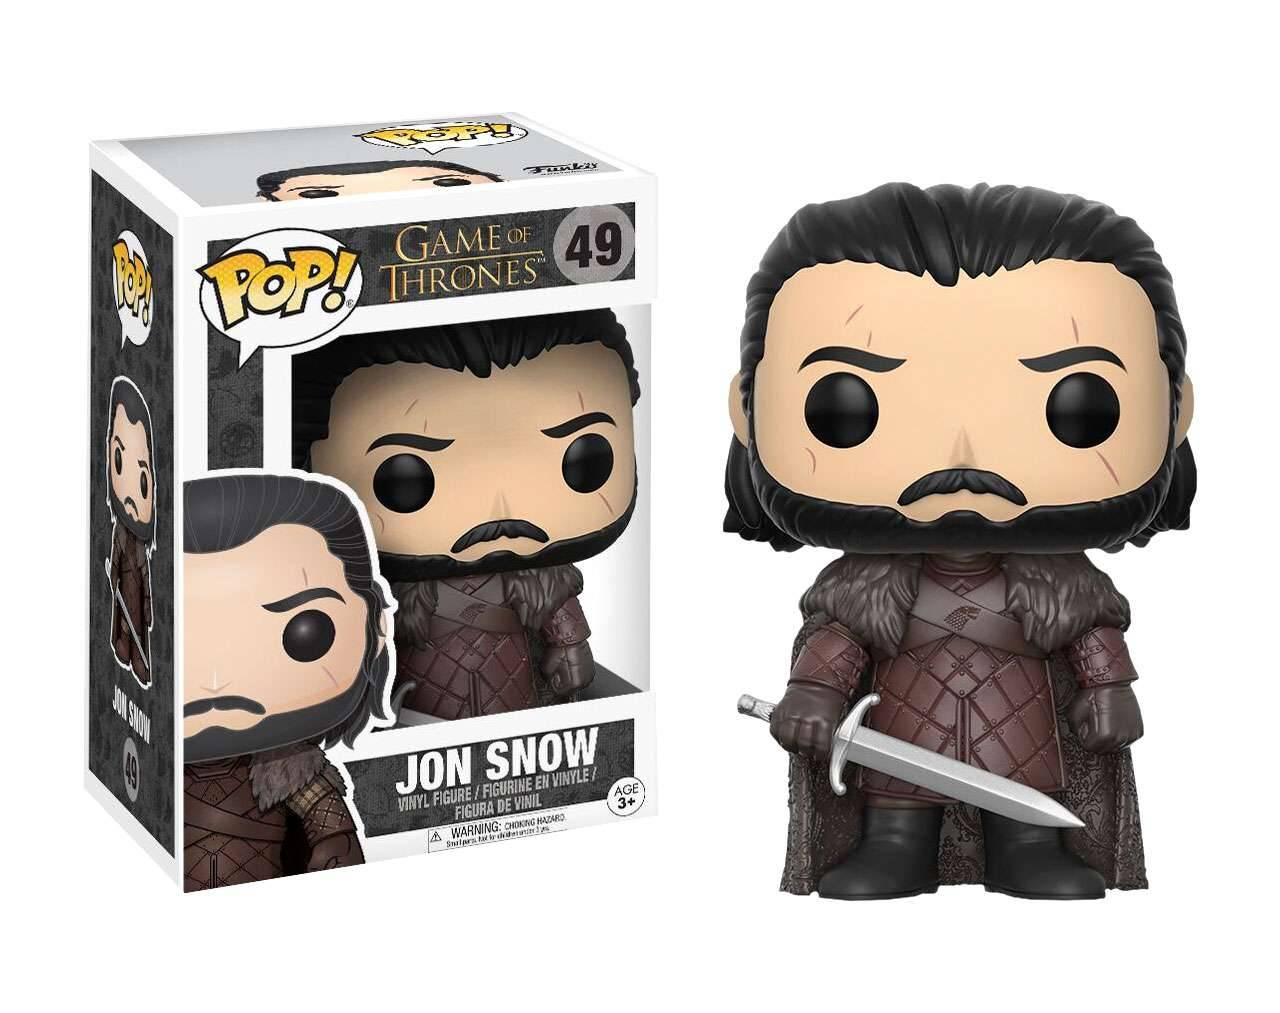 Jon Snow Pop! Vinyl